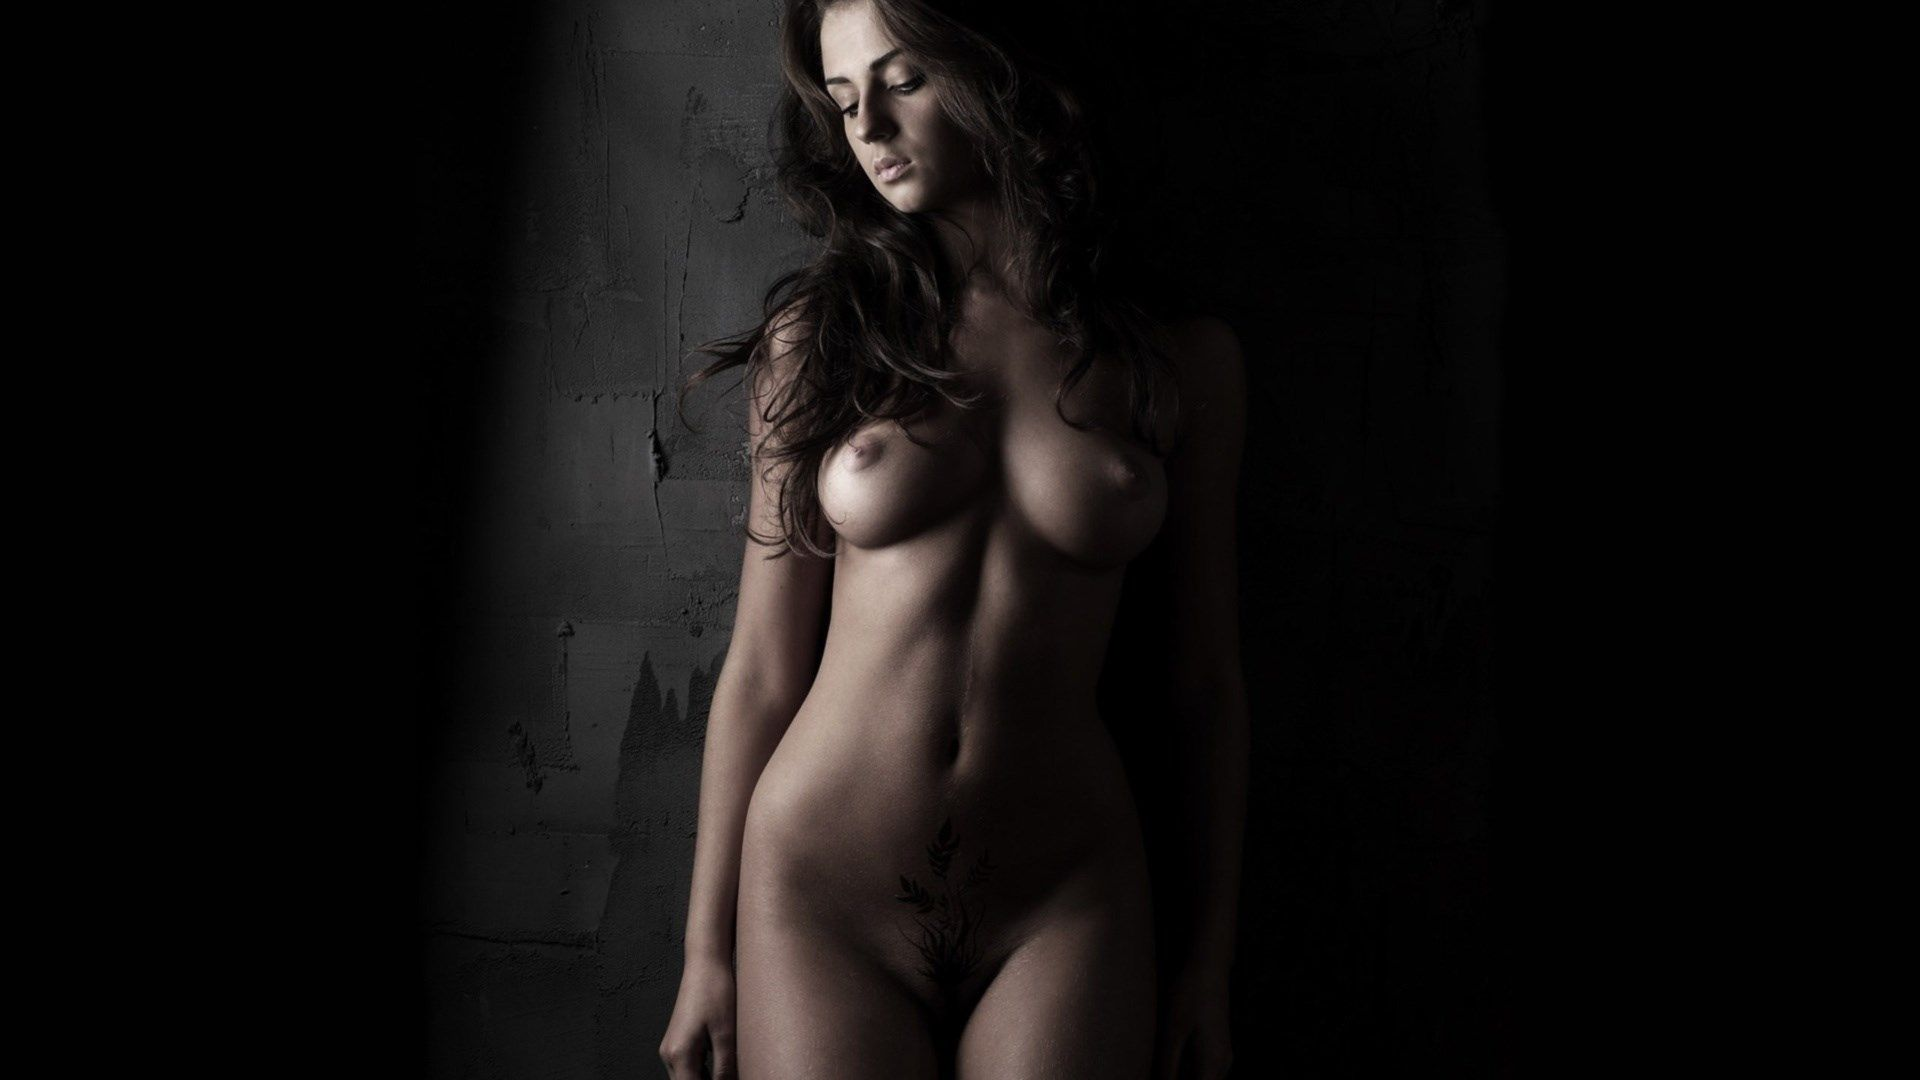 Hd pics nude art — img 15